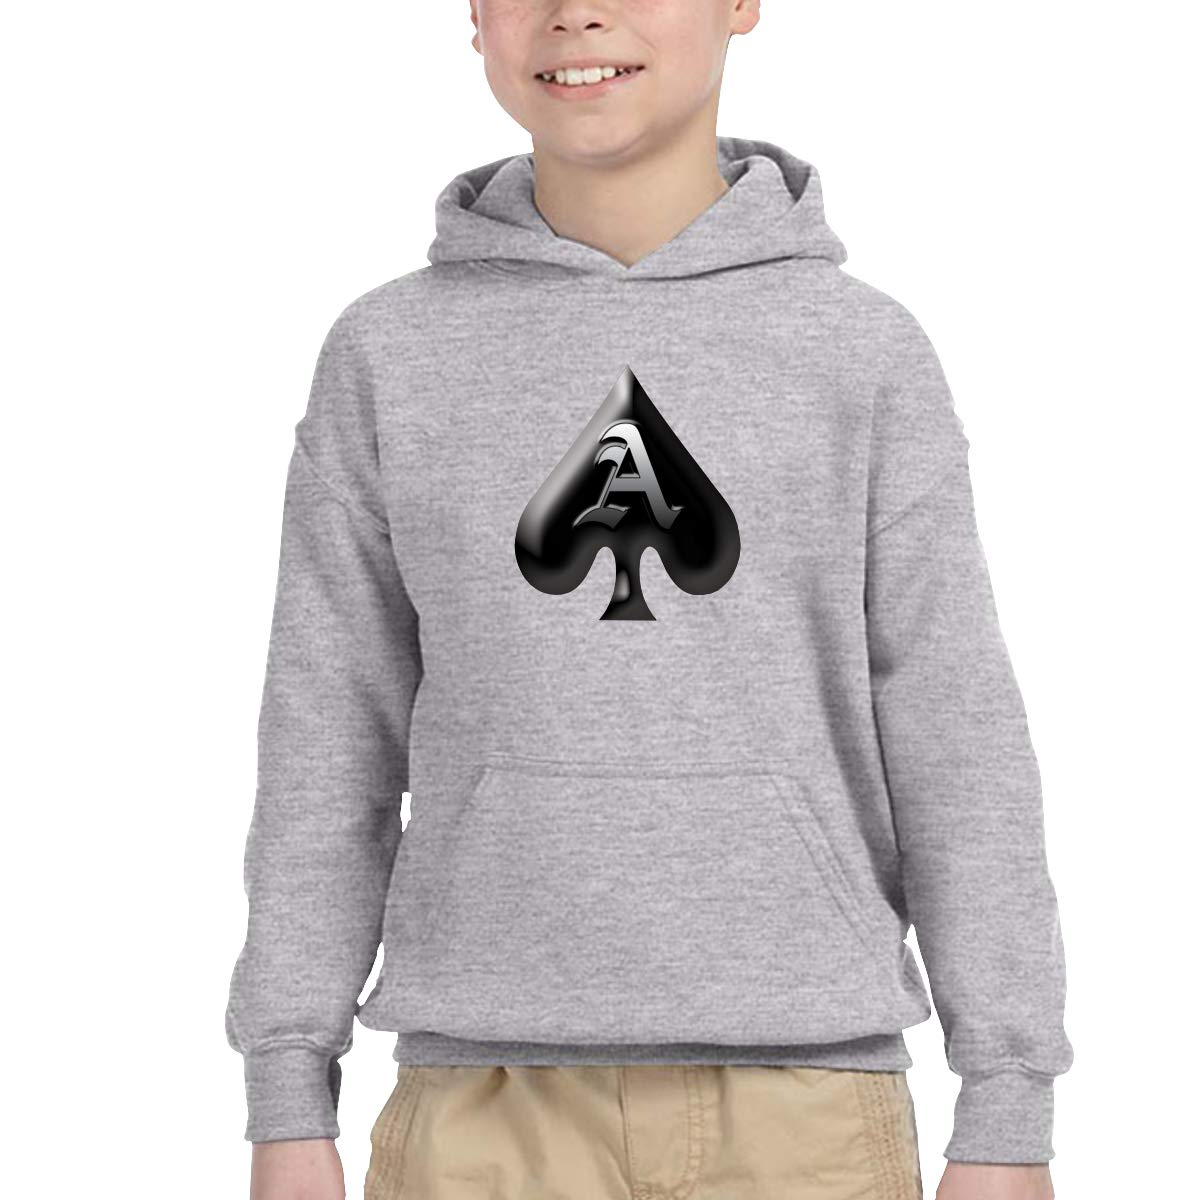 ACE Logo Youth Hip Hop Pullover Hoodie Sweater with Kangaroo Pocket Hooded Sweatshirts